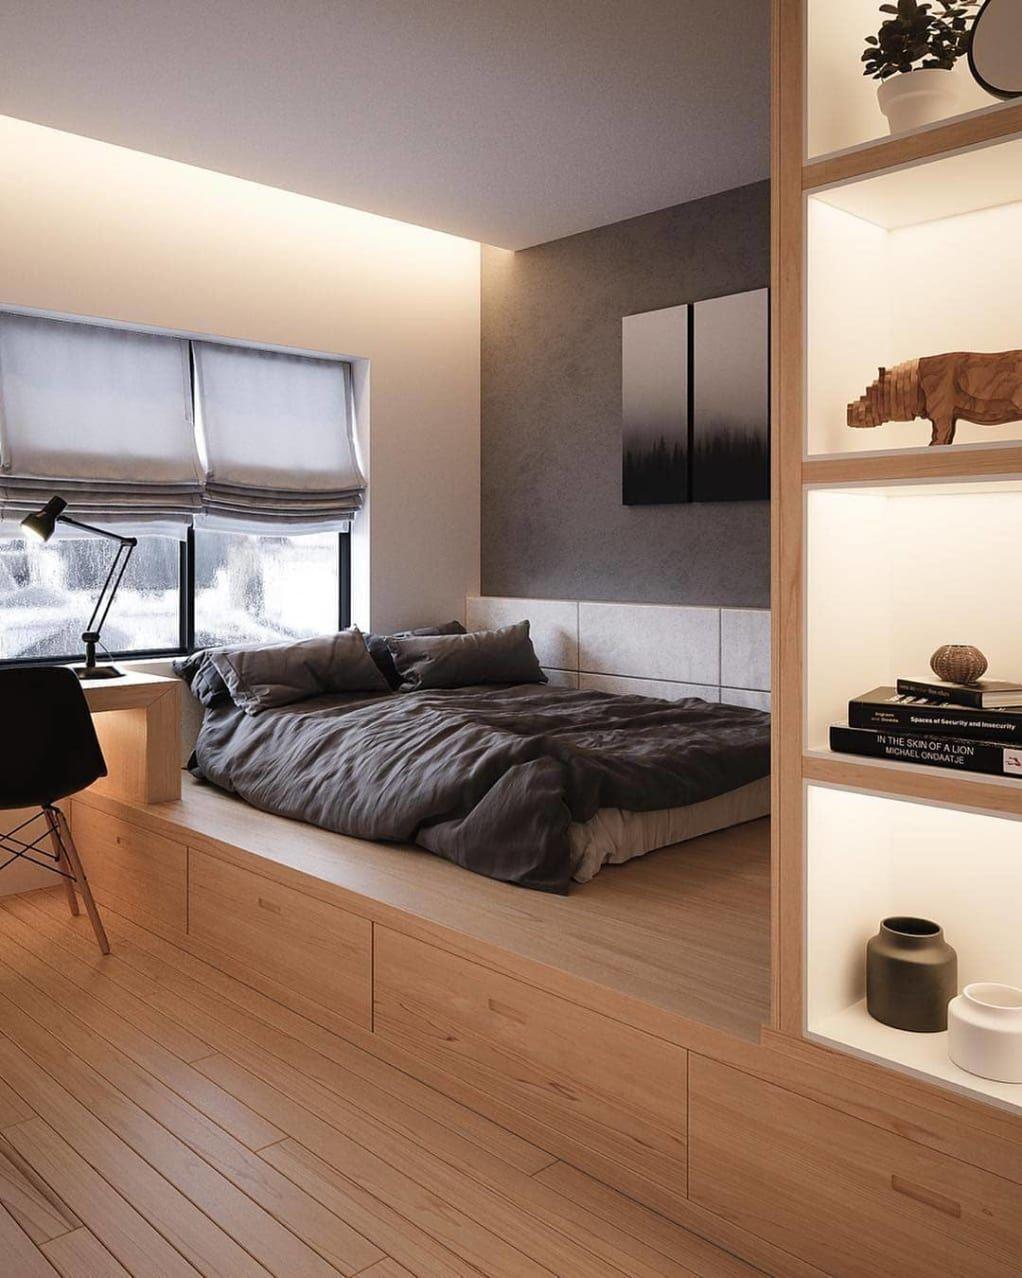 Minimal Interior Design Inspiration 210 Desain Interior Ide Kamar Tidur Ide Dekorasi Kamar Tidur Bedroom interior design inspiration